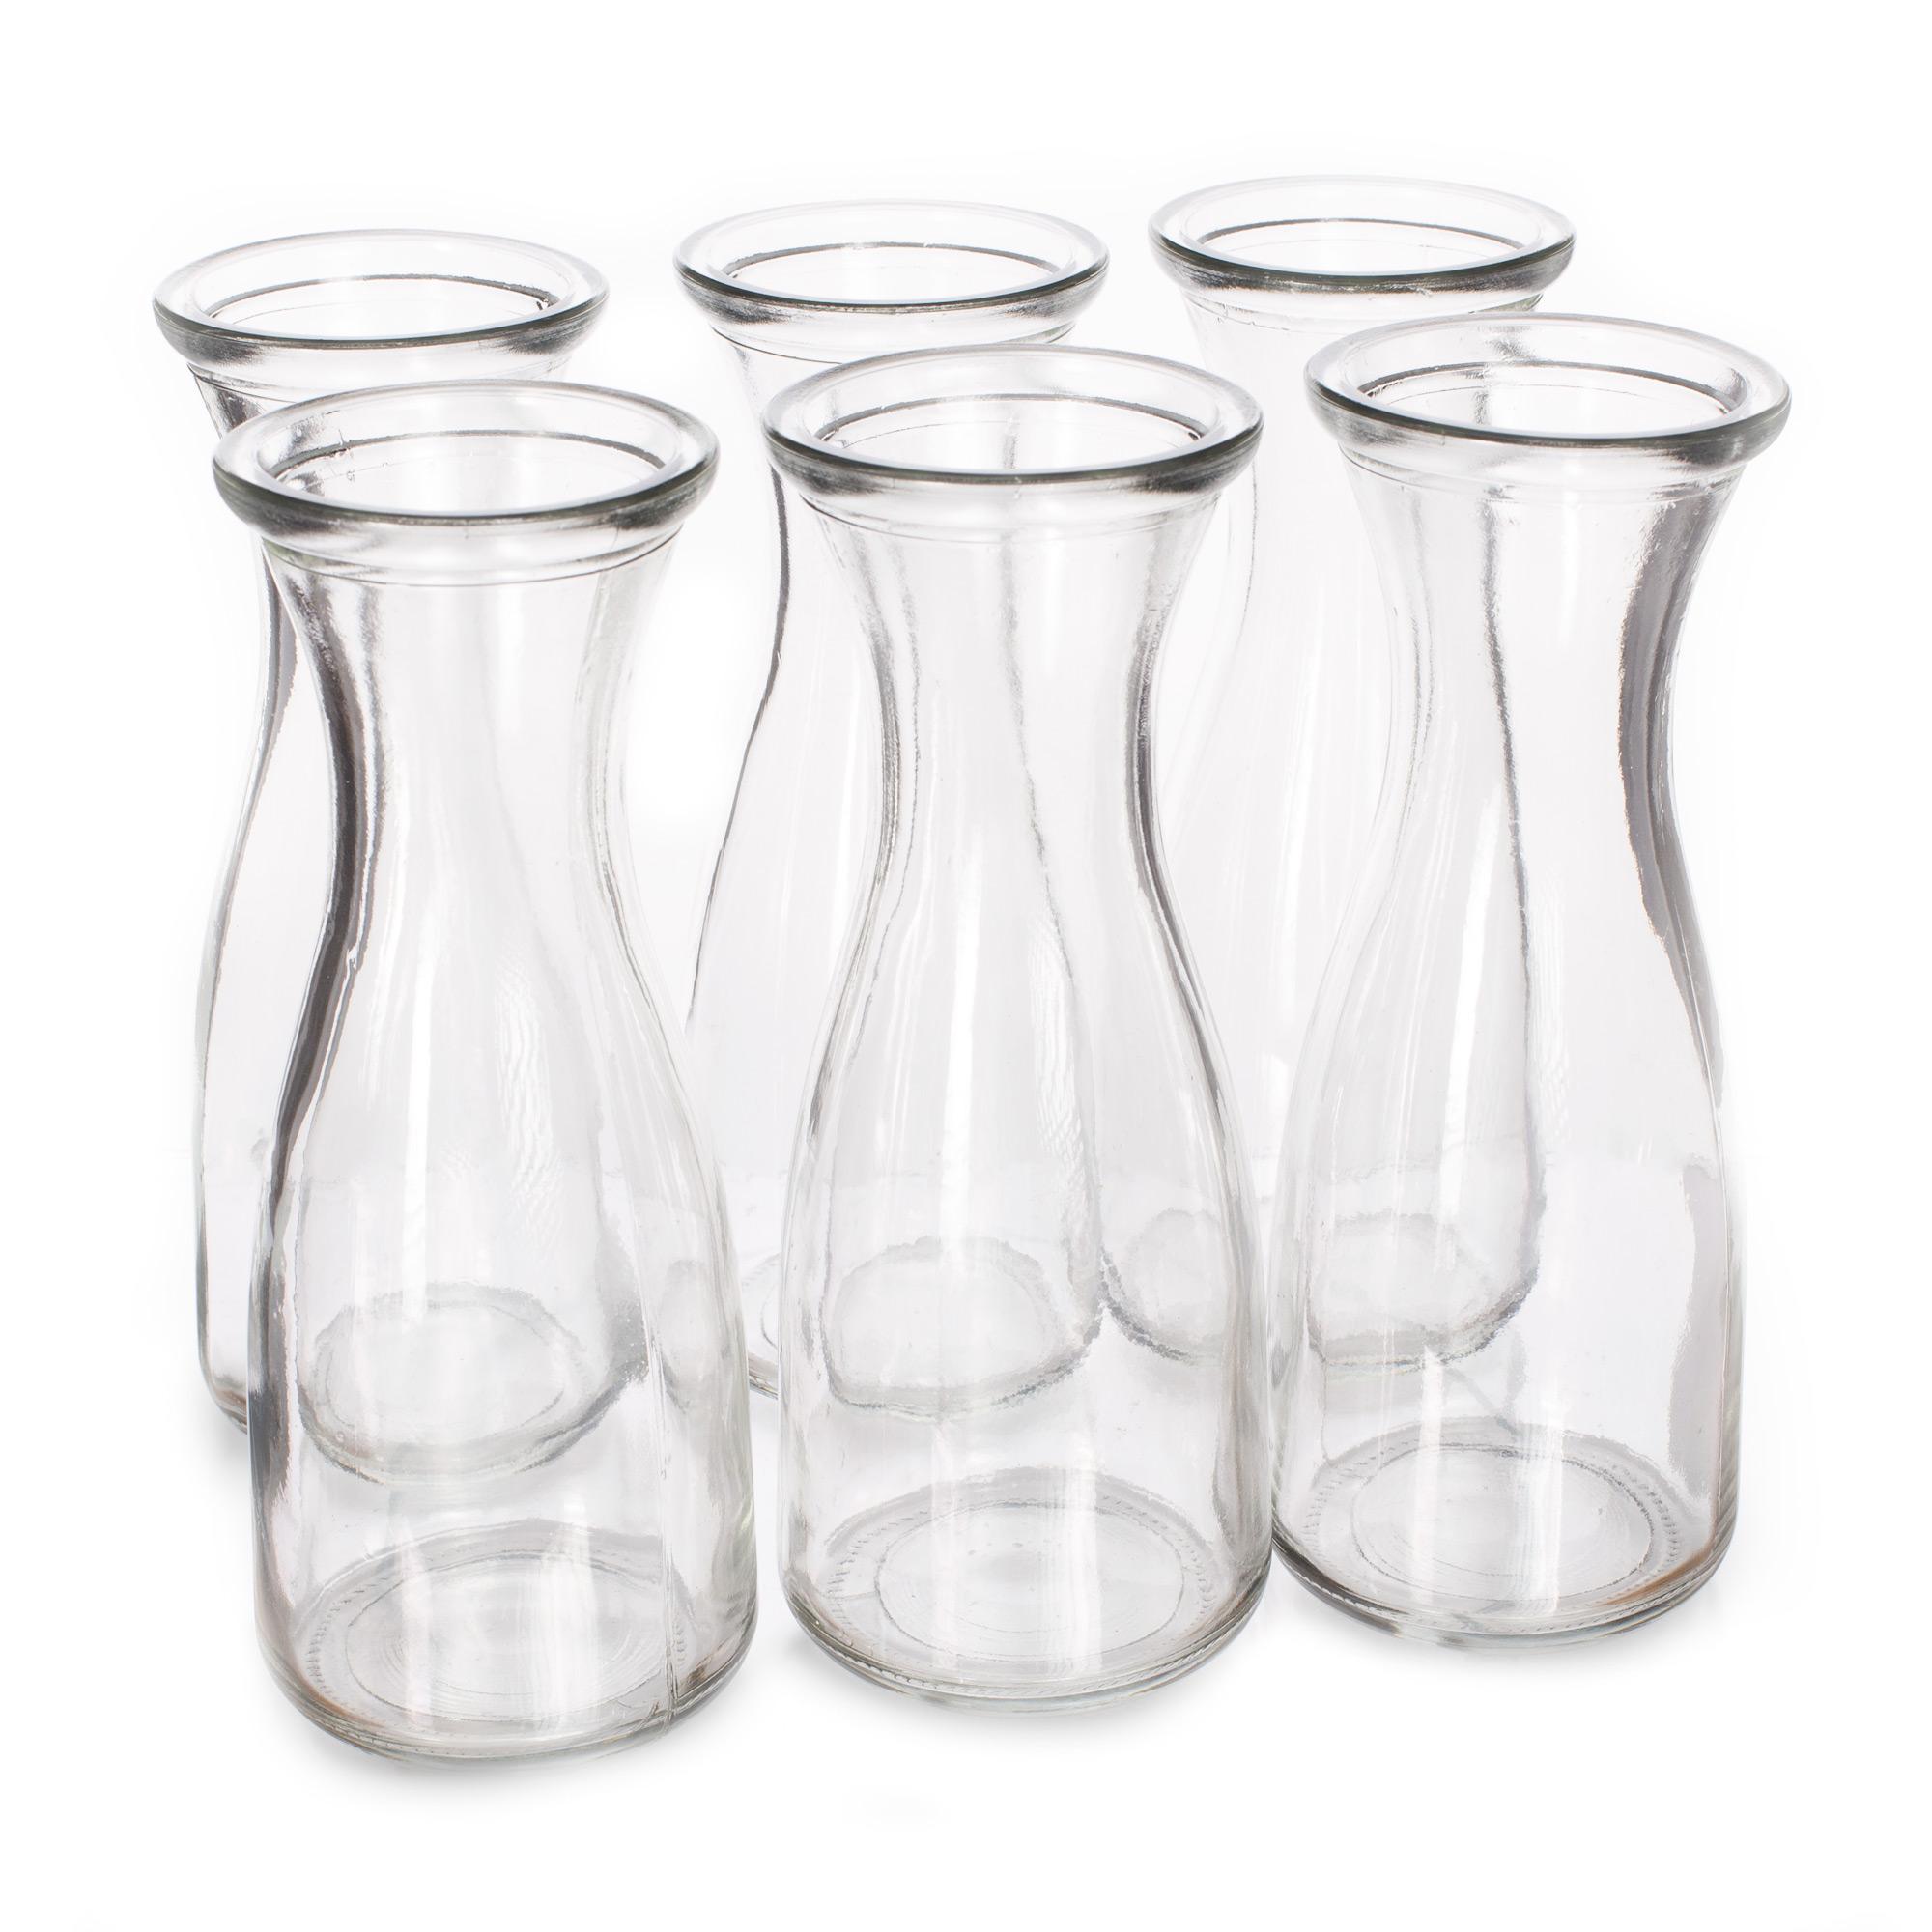 17 oz. (500mL) Glass Beverage Carafe, 6-pack